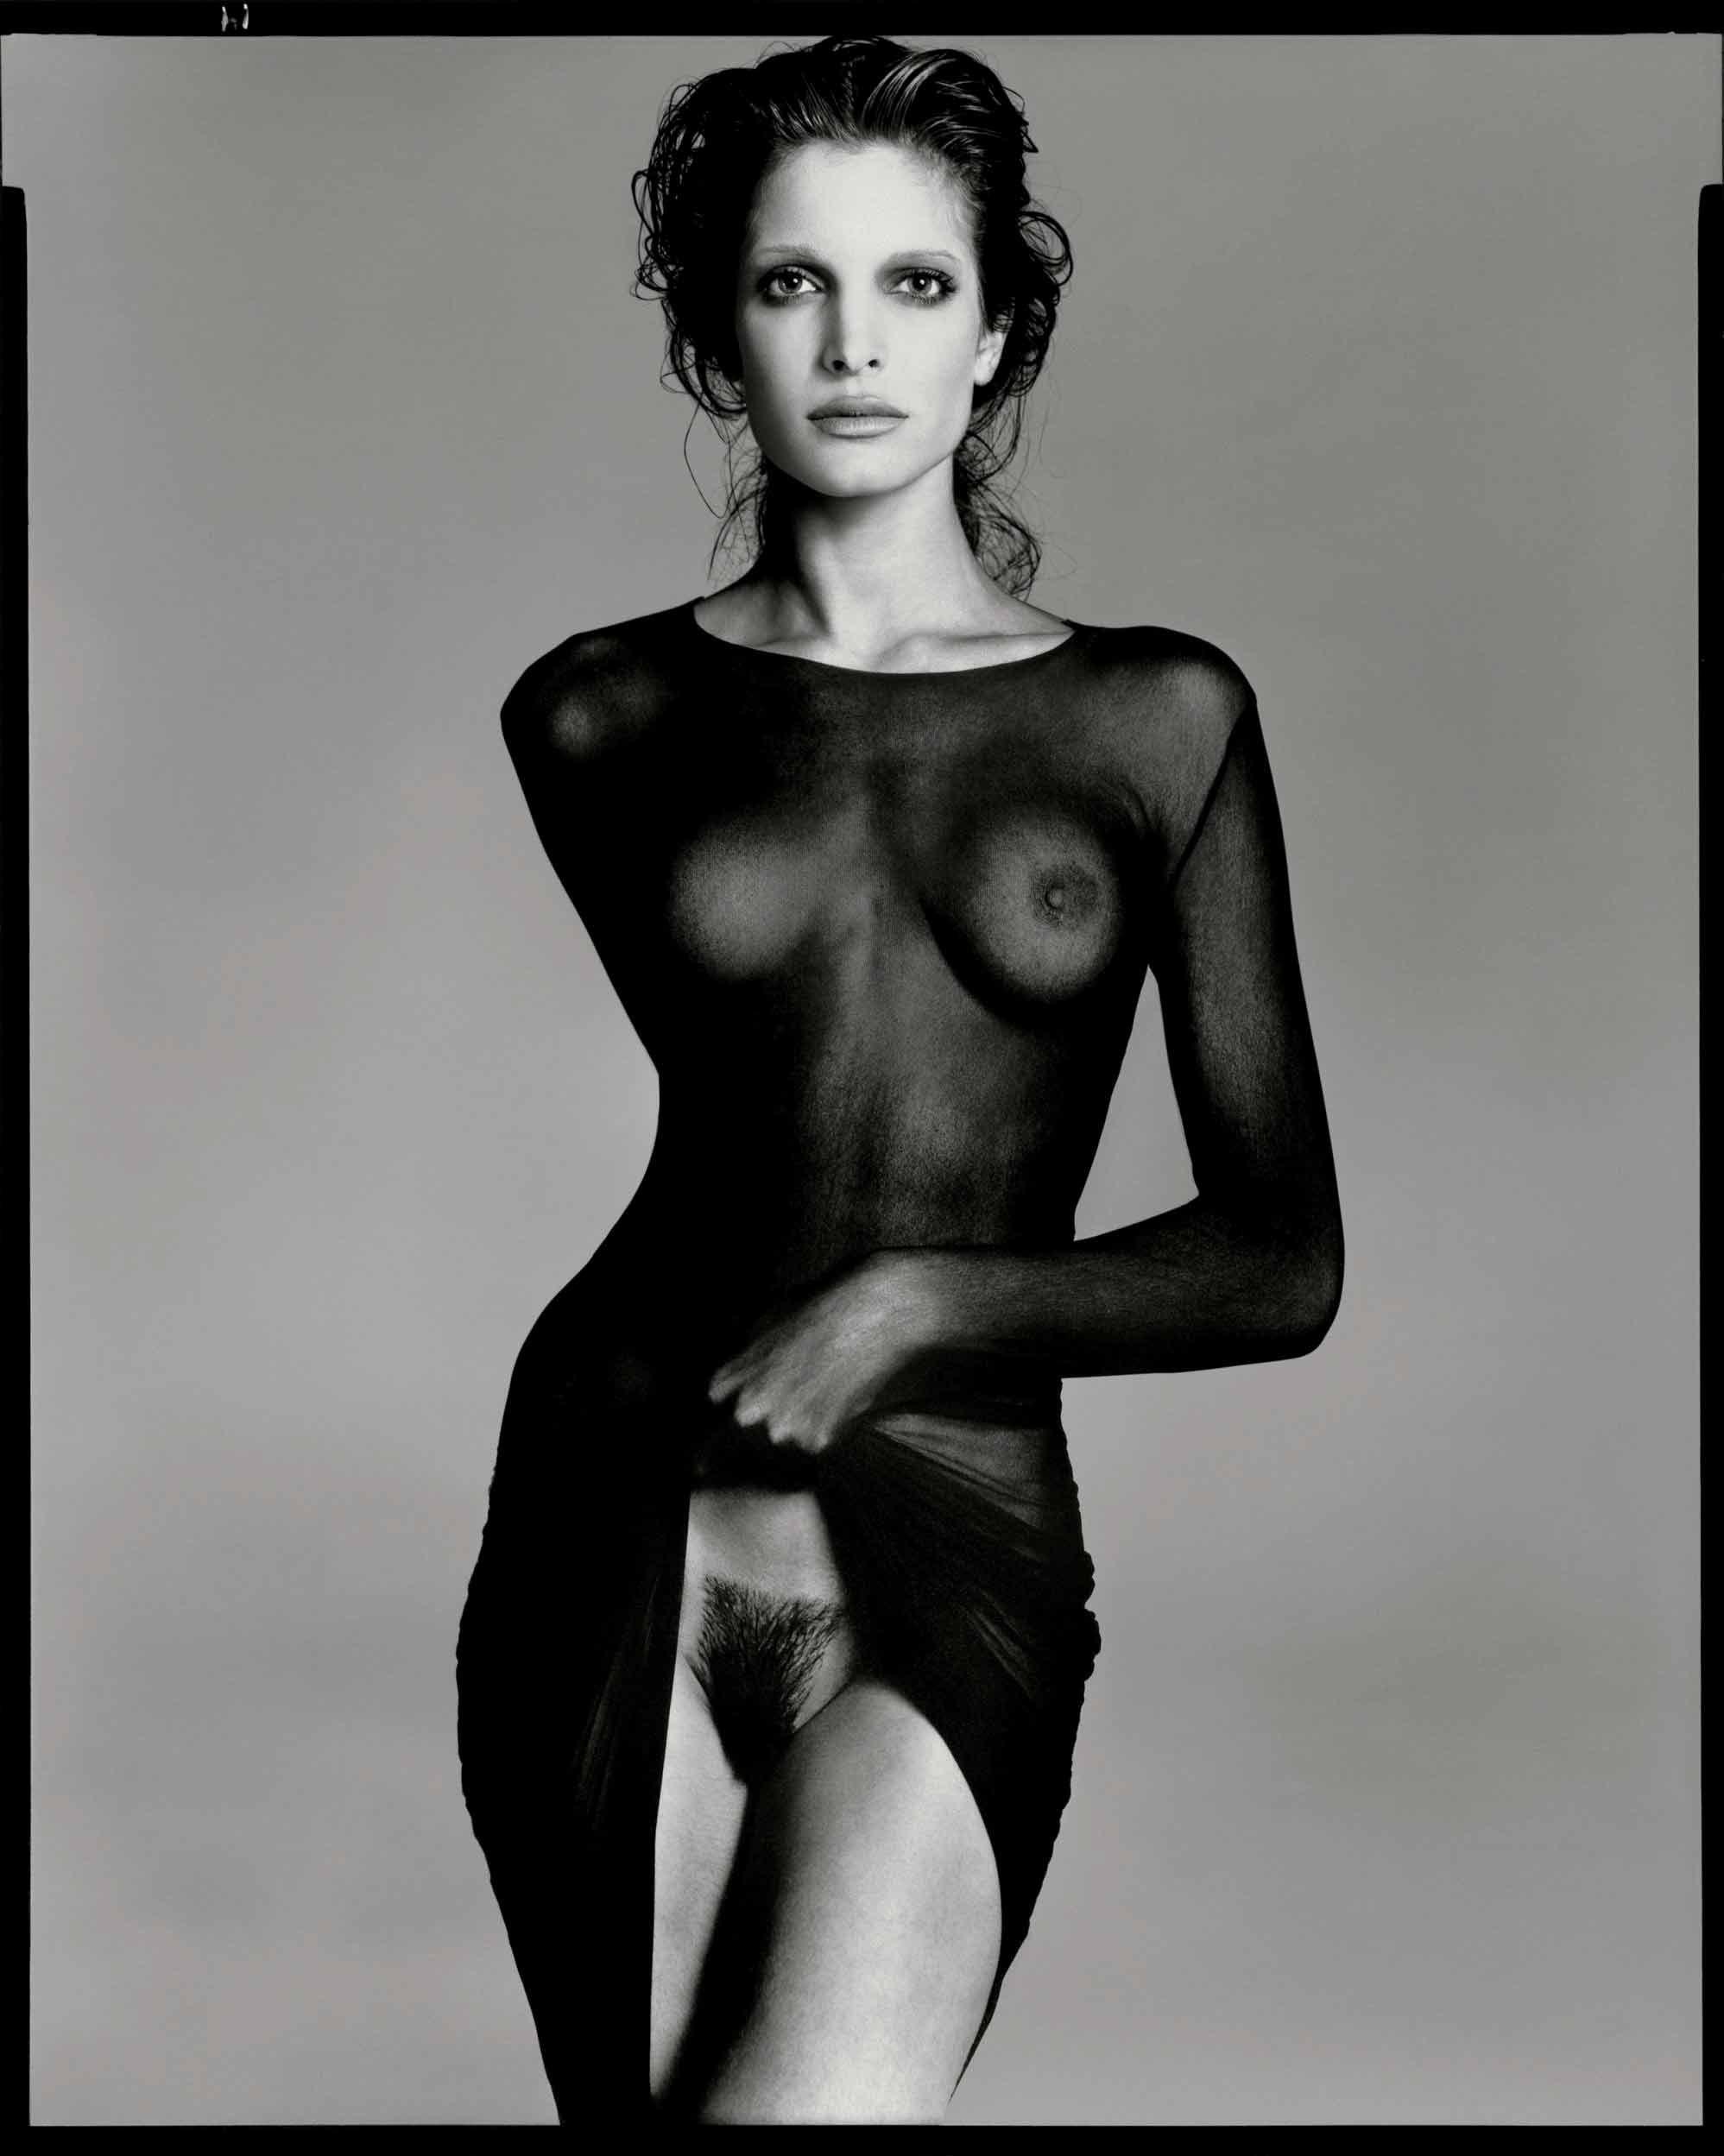 Stephanie Seymour, model, New York City, May 9, 1992